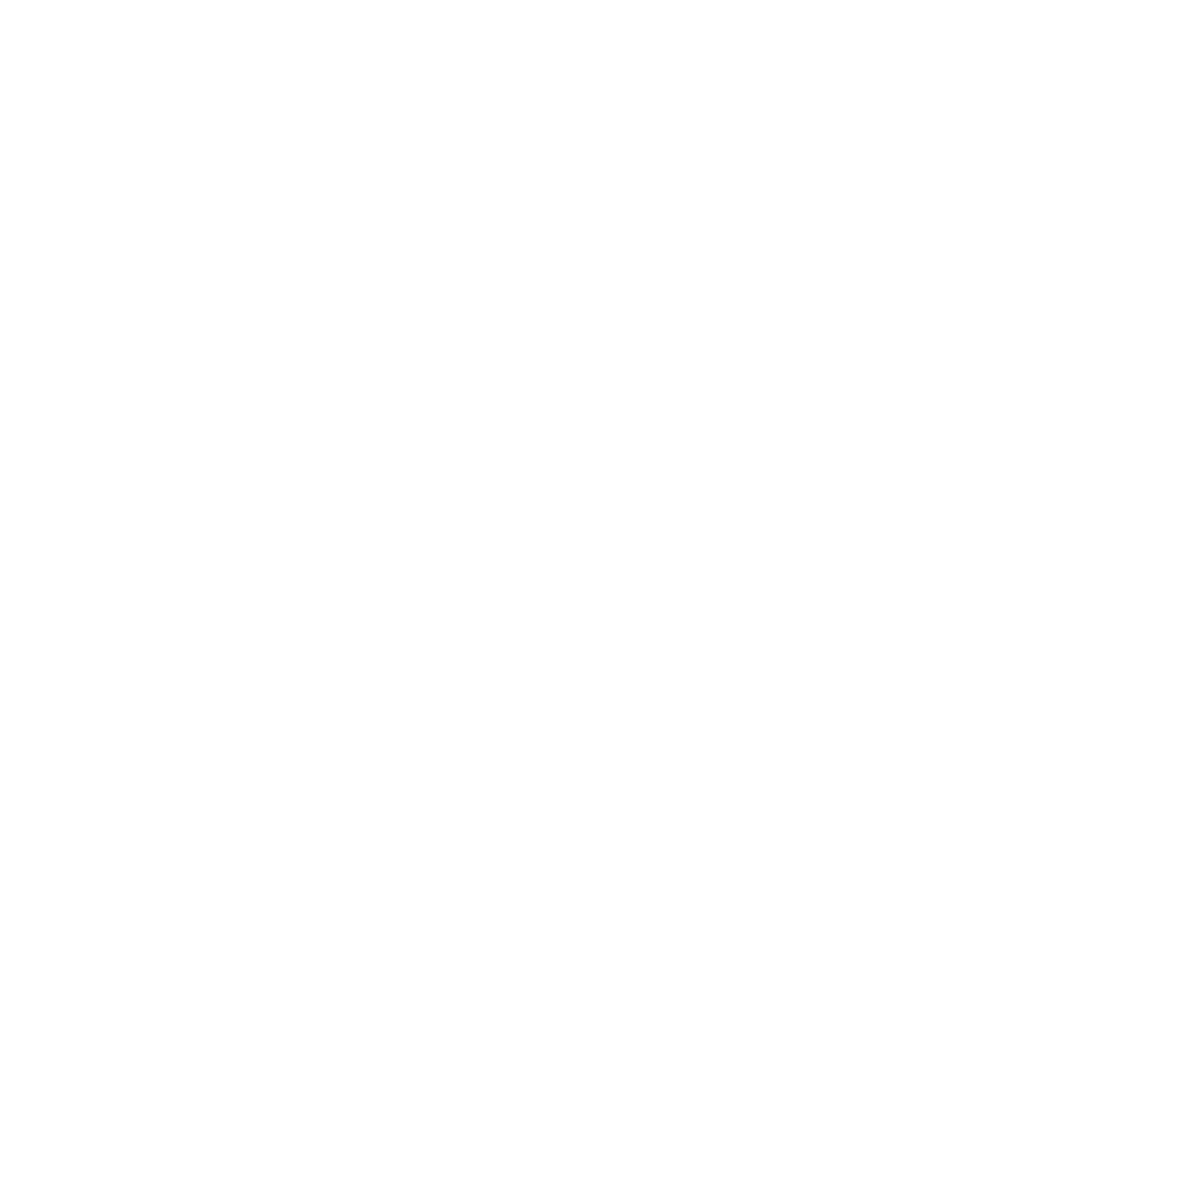 Flagship - The Temple Of Enthusiasm - Canggu